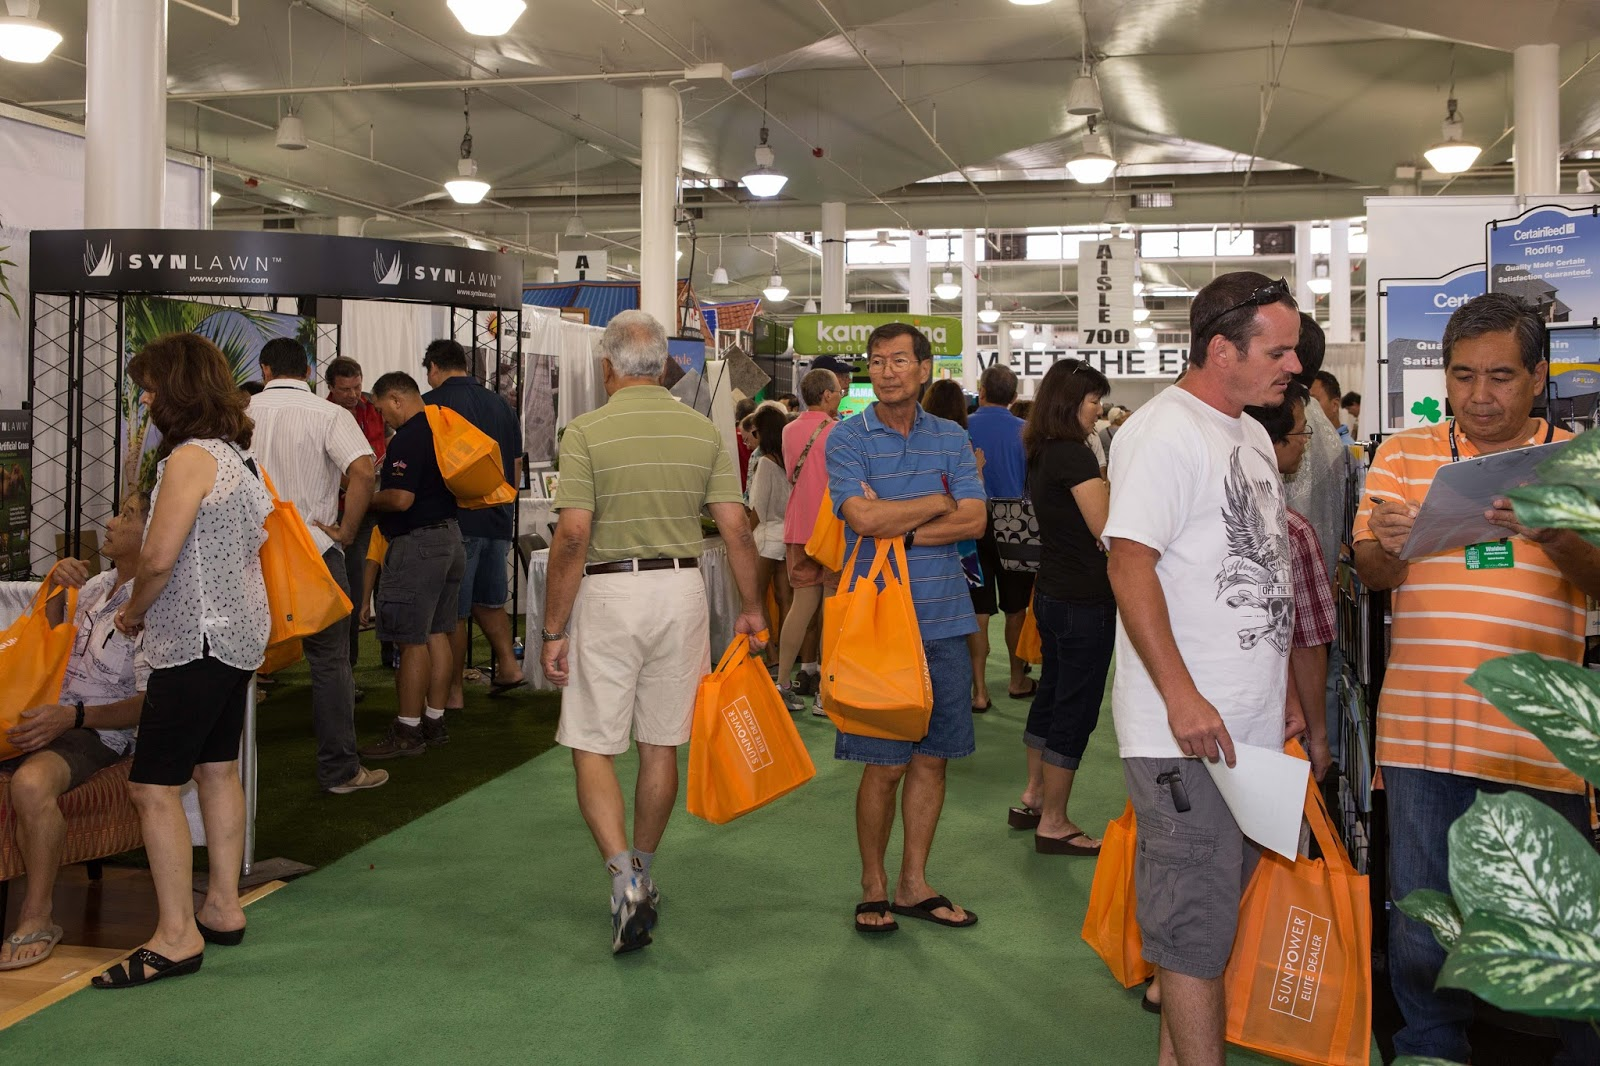 BIA-Hawaii: 9,743 Attend the 9th Annual BIA-Hawaii Remodel